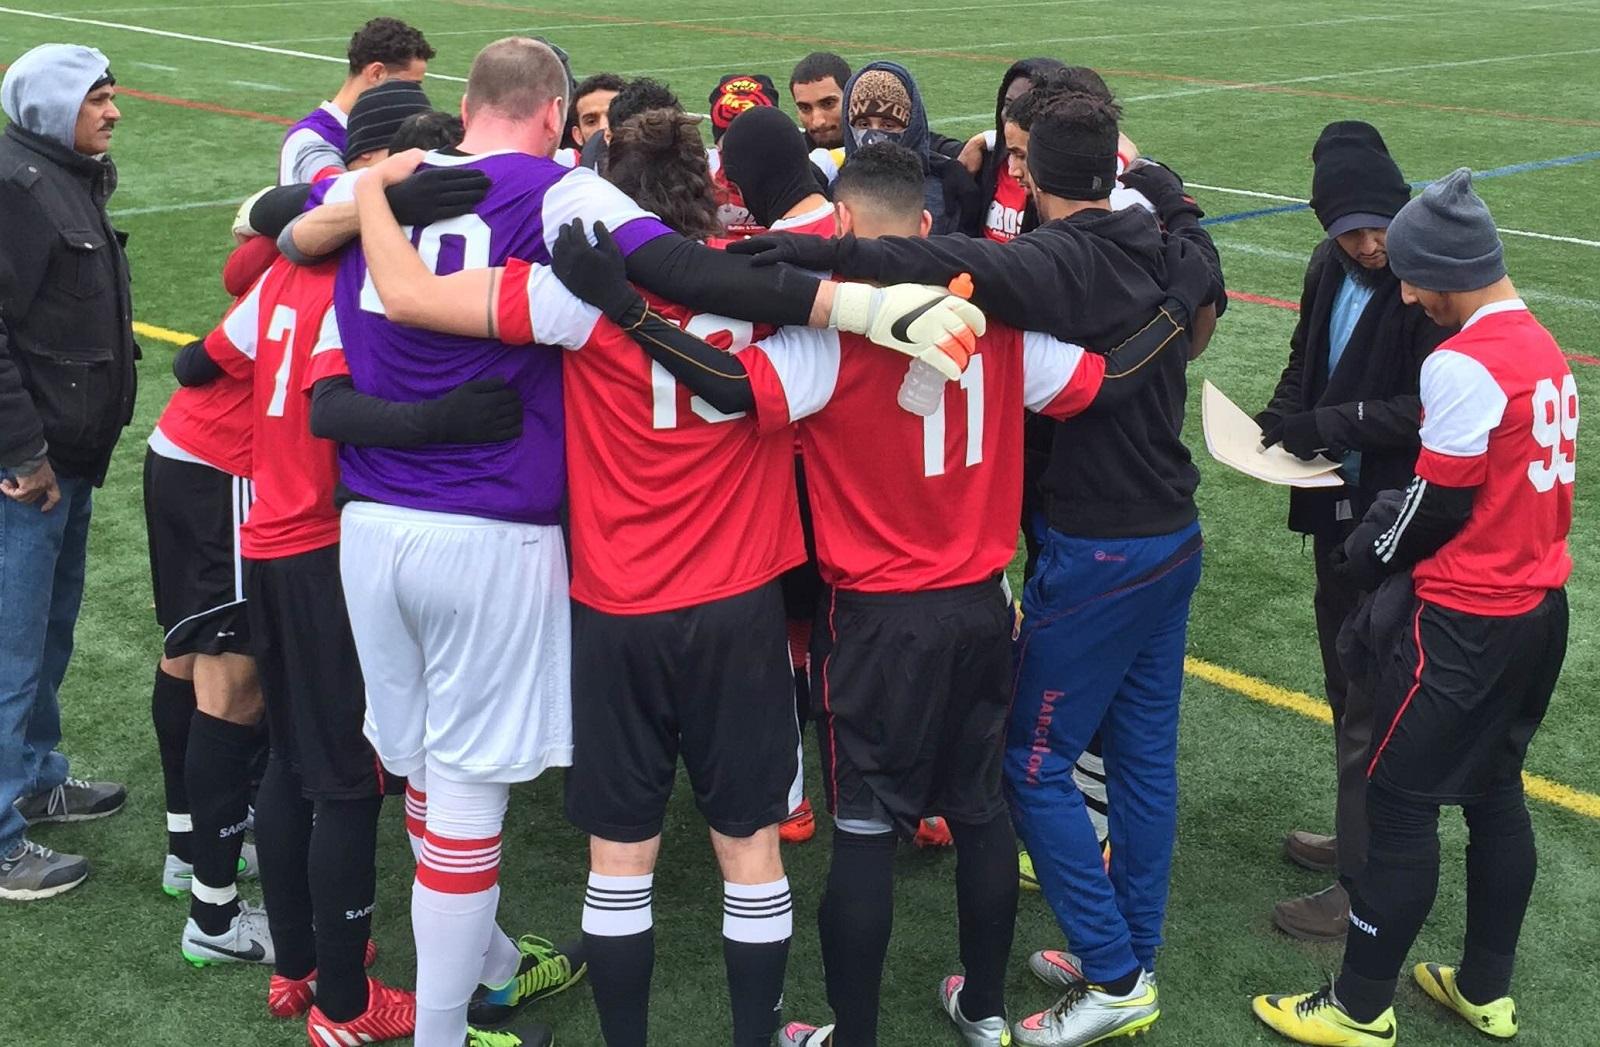 FC Yemen huddles up before their 3-0 loss to Christos FC. (Ben Tsujimoto/Buffalo News)